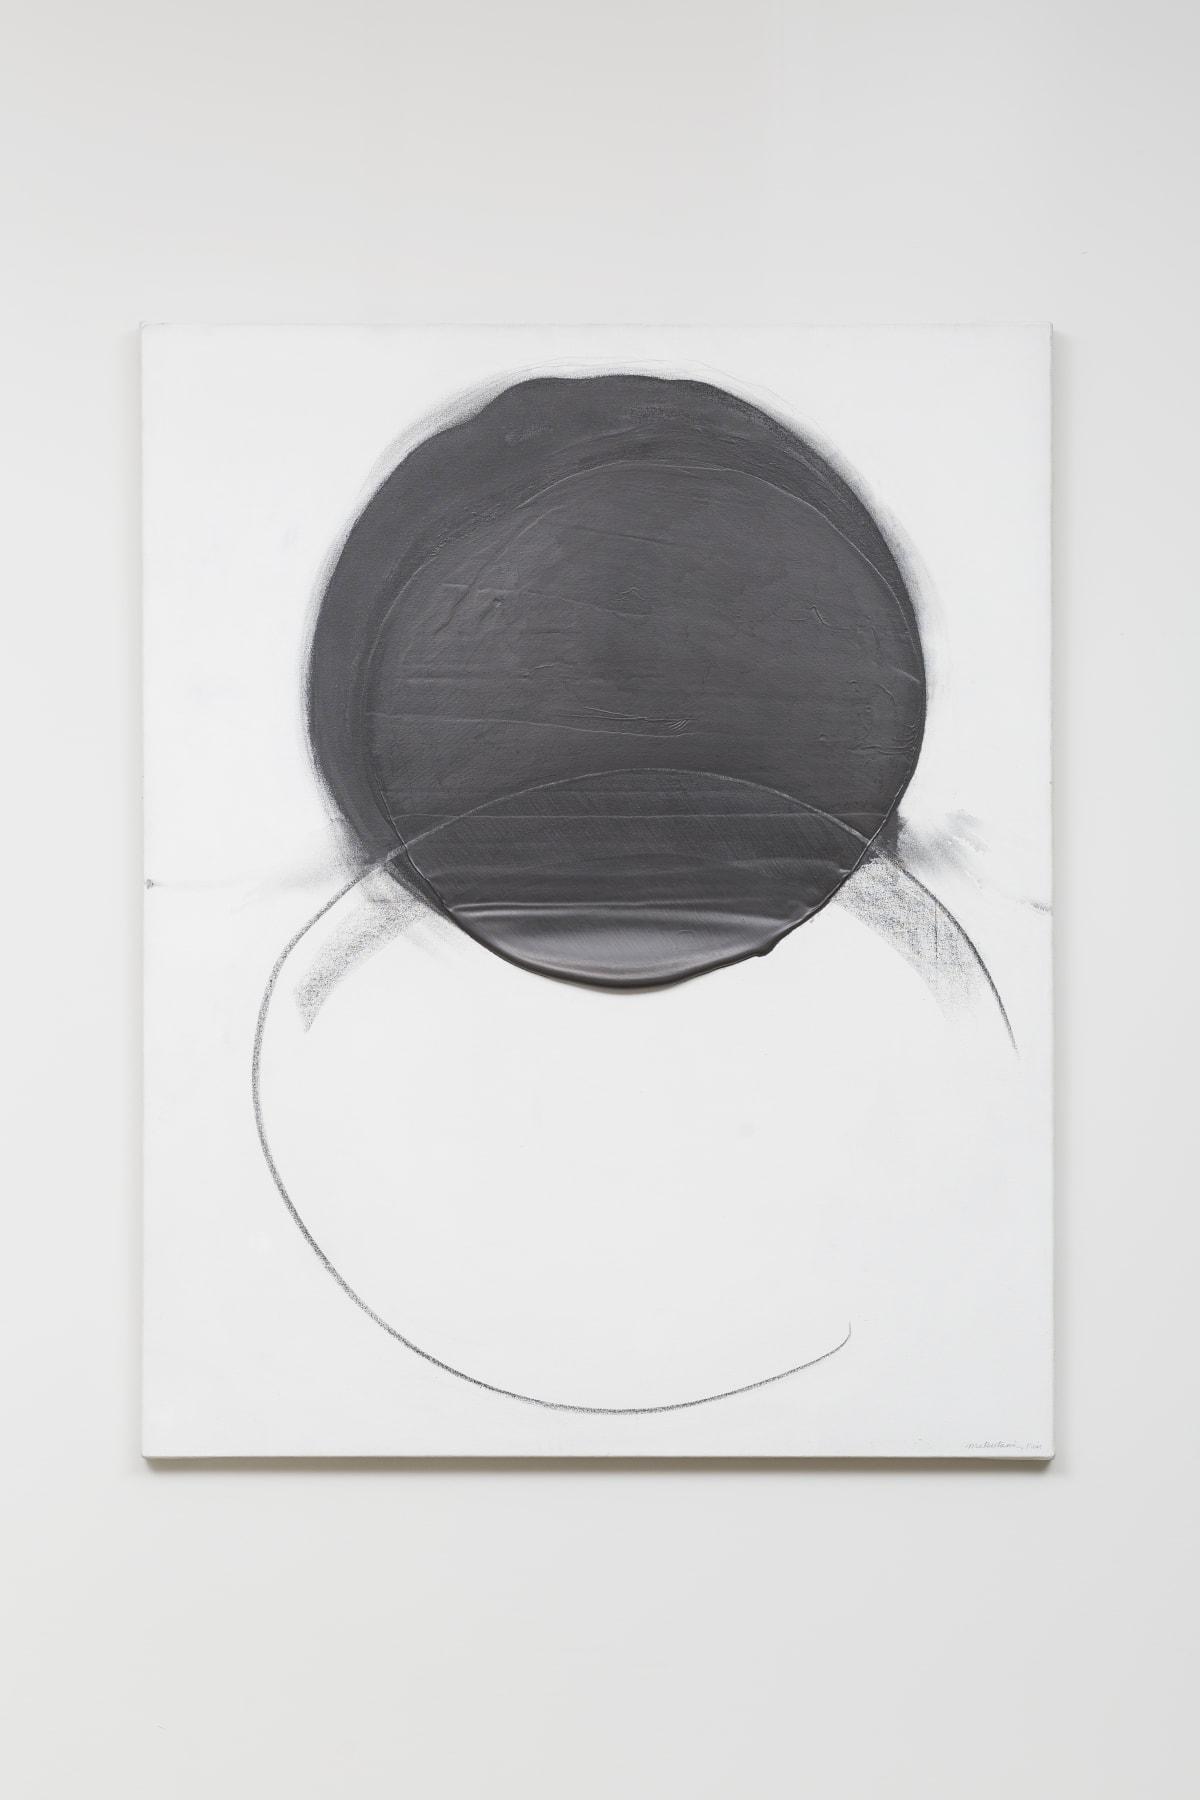 Takesada Matsutani, Two Circles, 2010